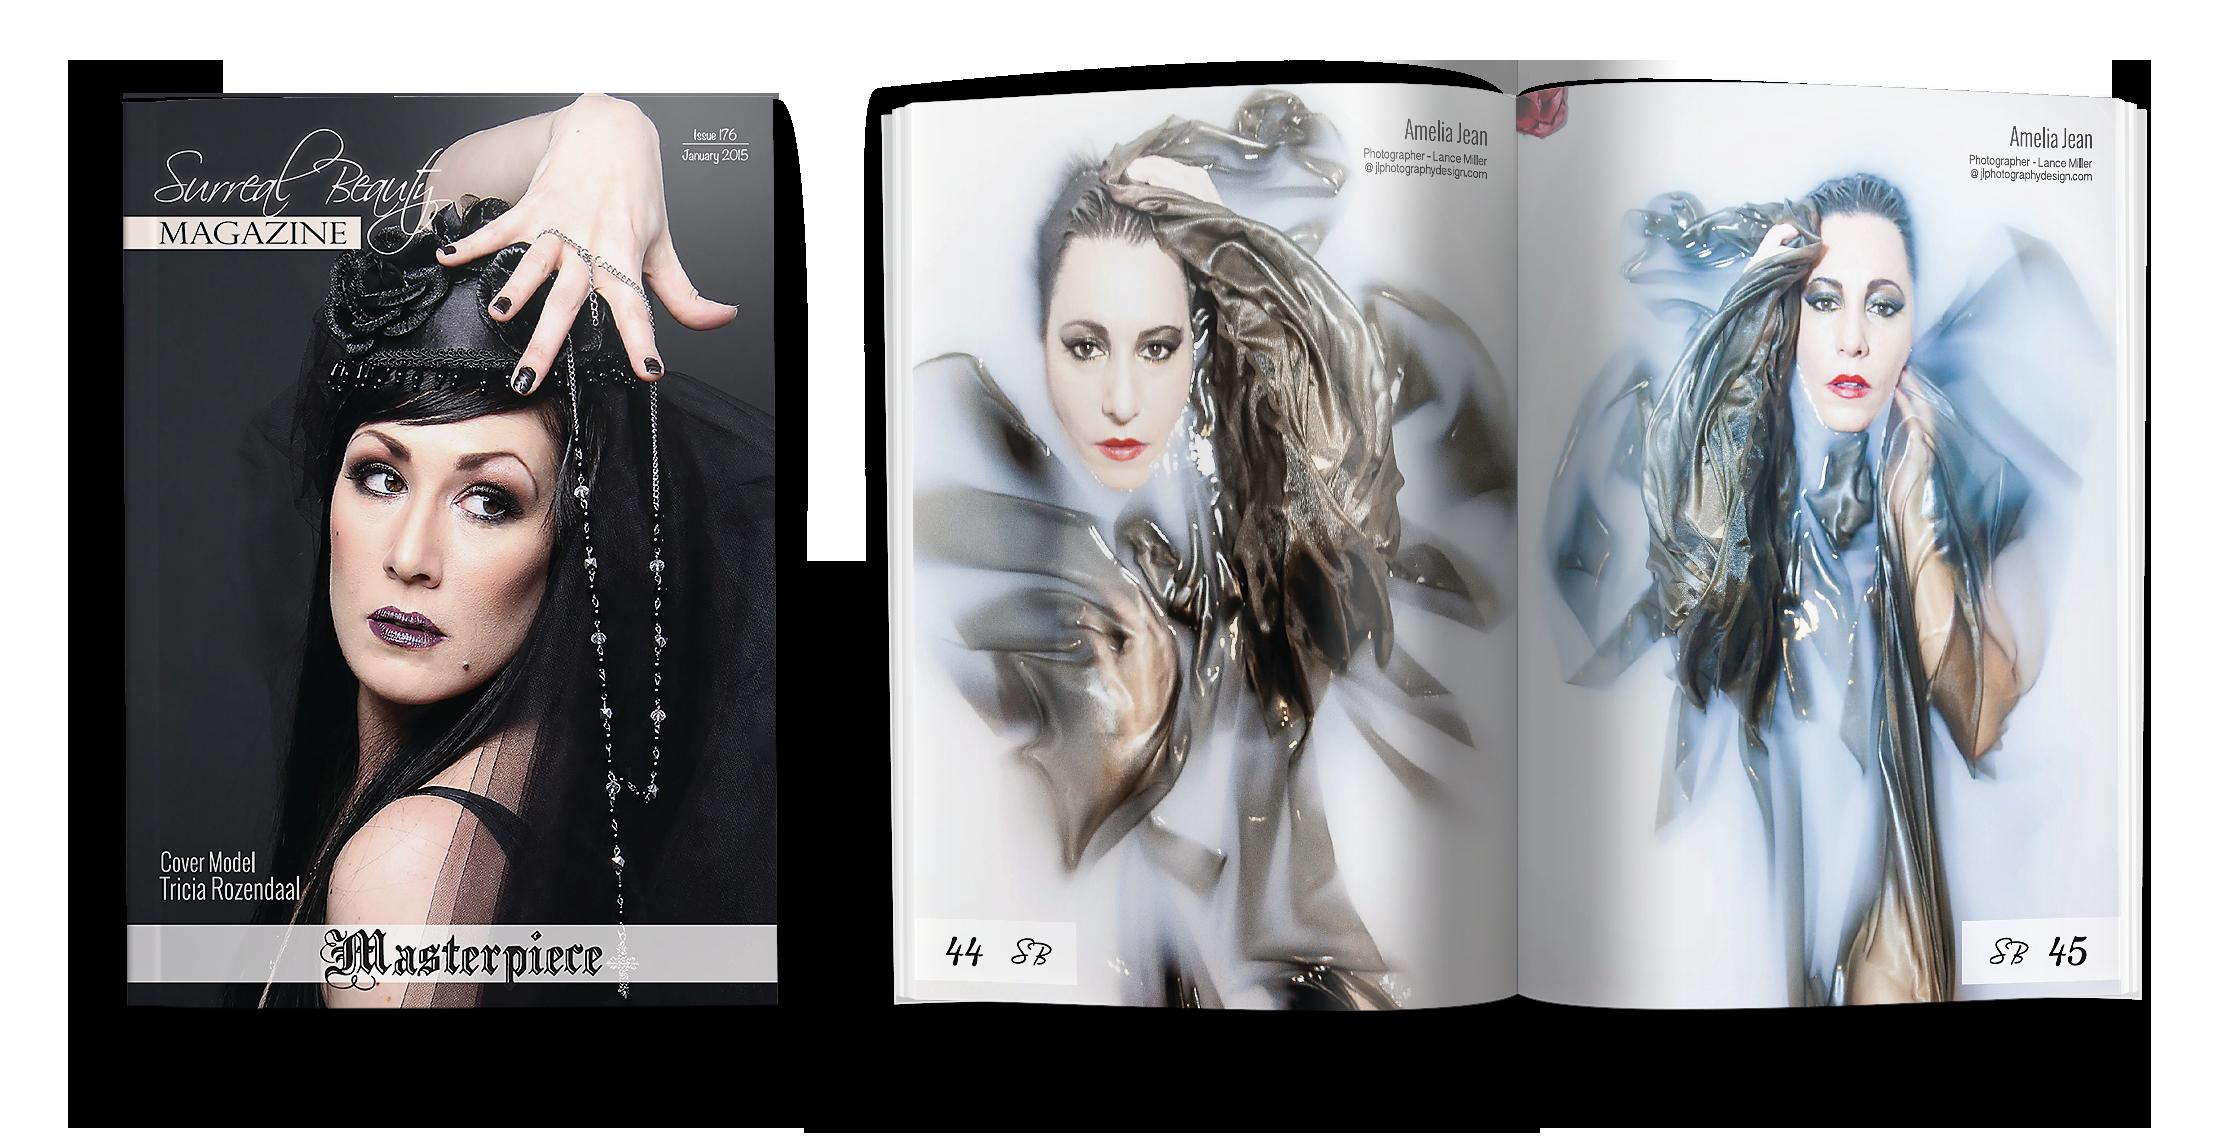 Surreal_Beauty_Magazine_Masterpiece_Beautiful_Life_Render2.png